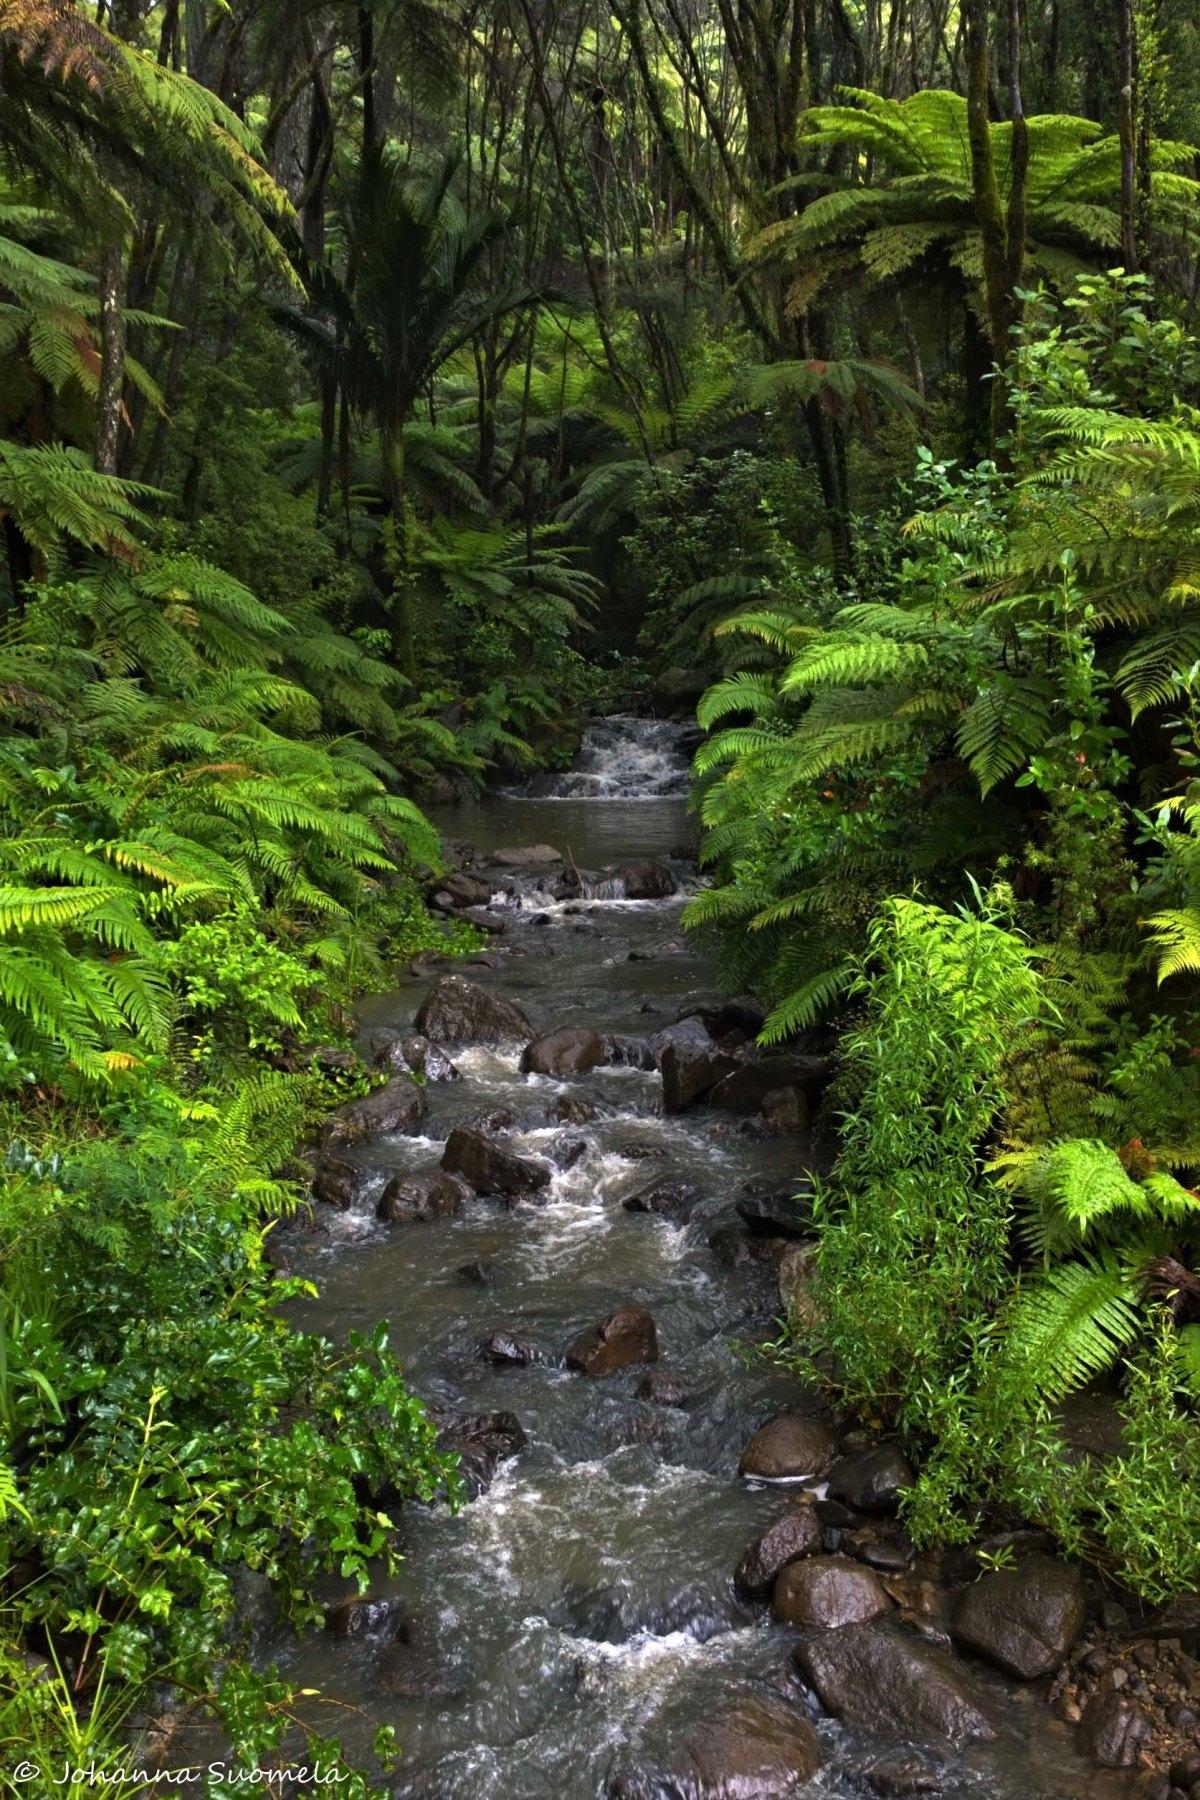 Uusi-Seelanti puro ja saniaisia